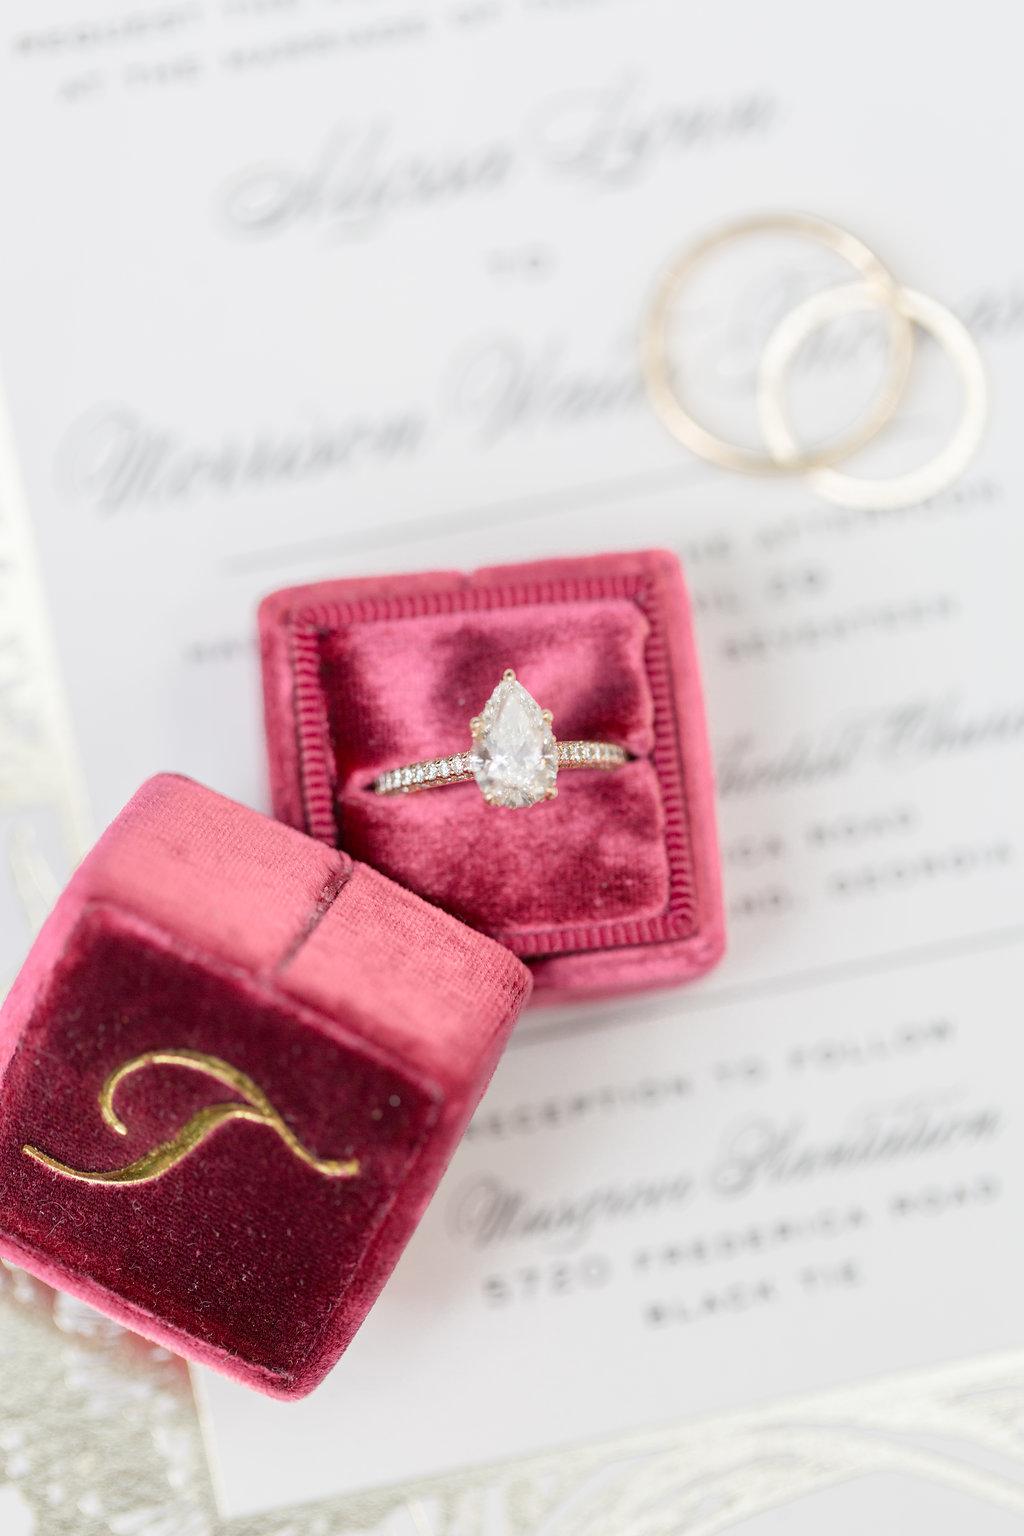 Pear Shaped Engagement Ring - Musgrove Plantation Georgia Wedding Venue